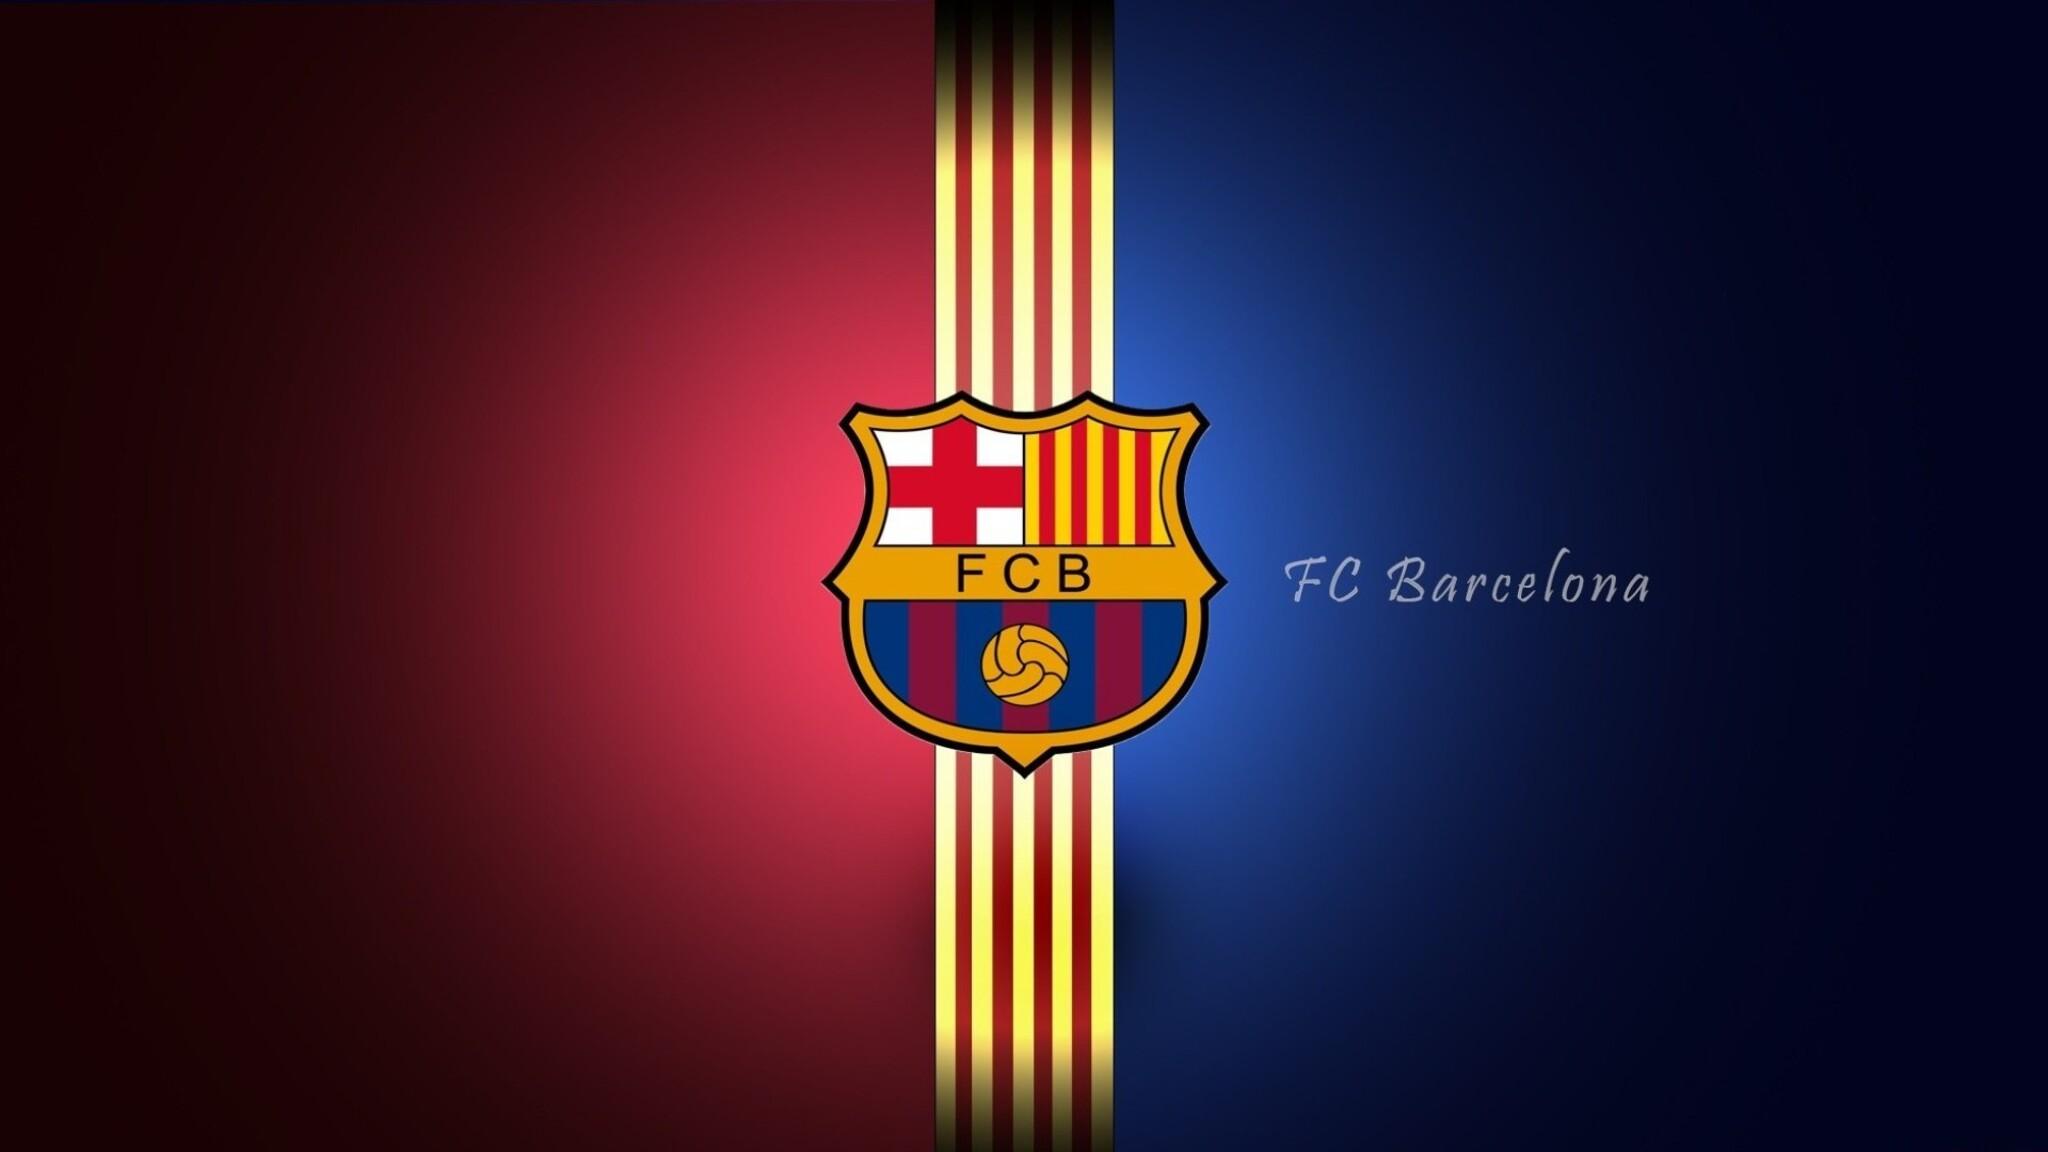 2048x1152 Fc Barcelona 2048x1152 Resolution HD 4k